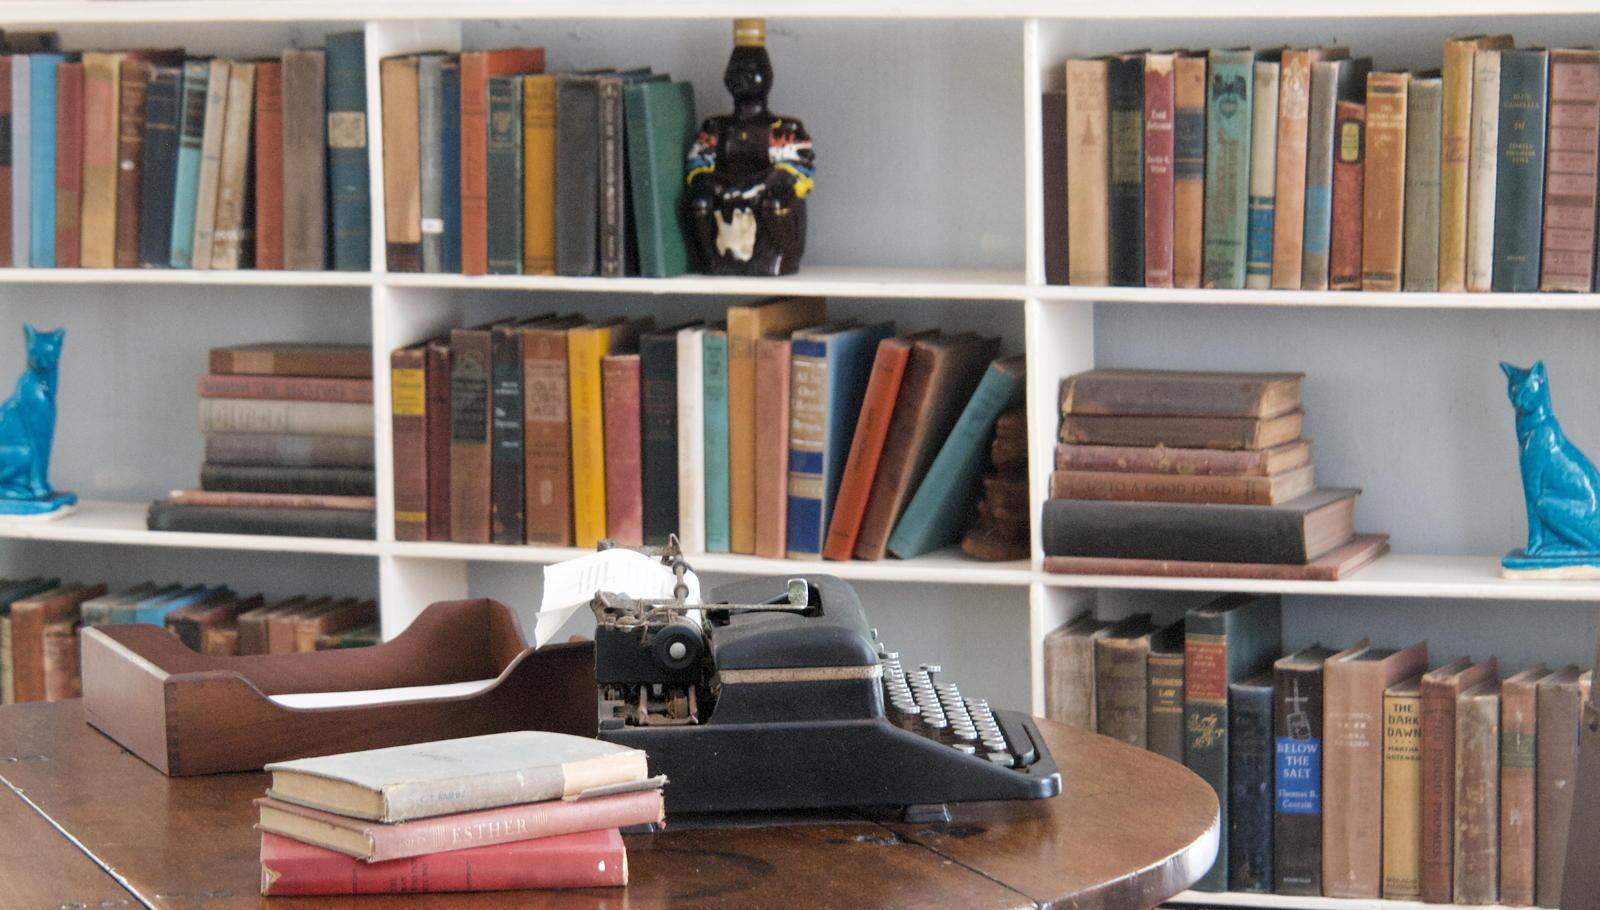 Hemingway's Library